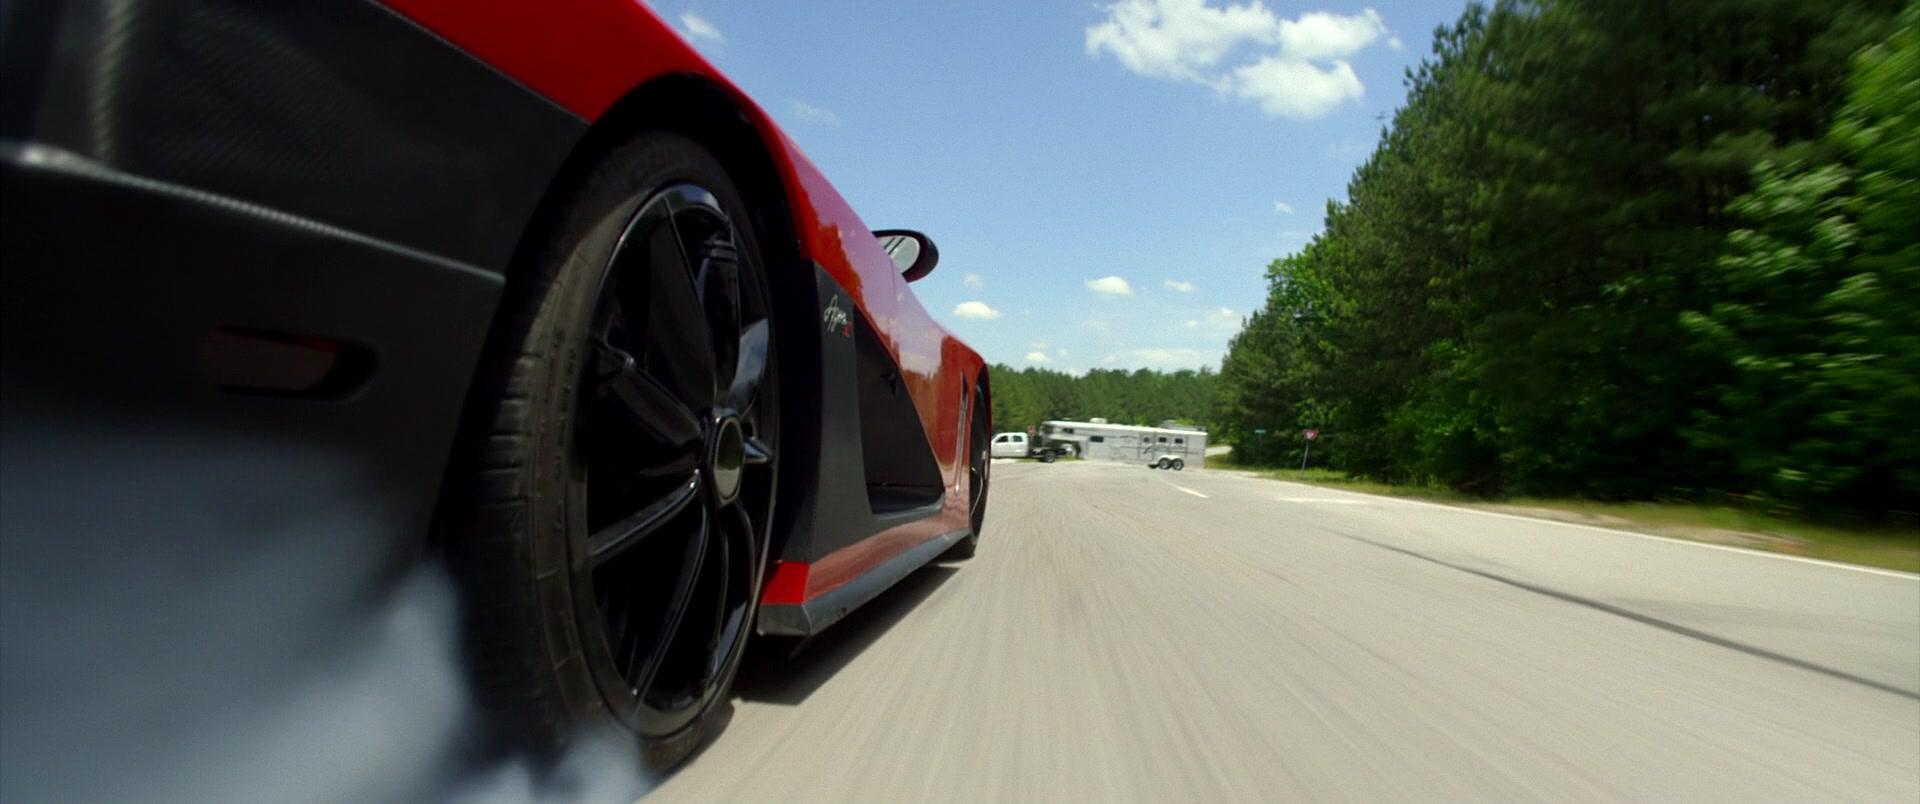 Koenigsegg Agera R Red Sports Car Driven By Dominic Cooper